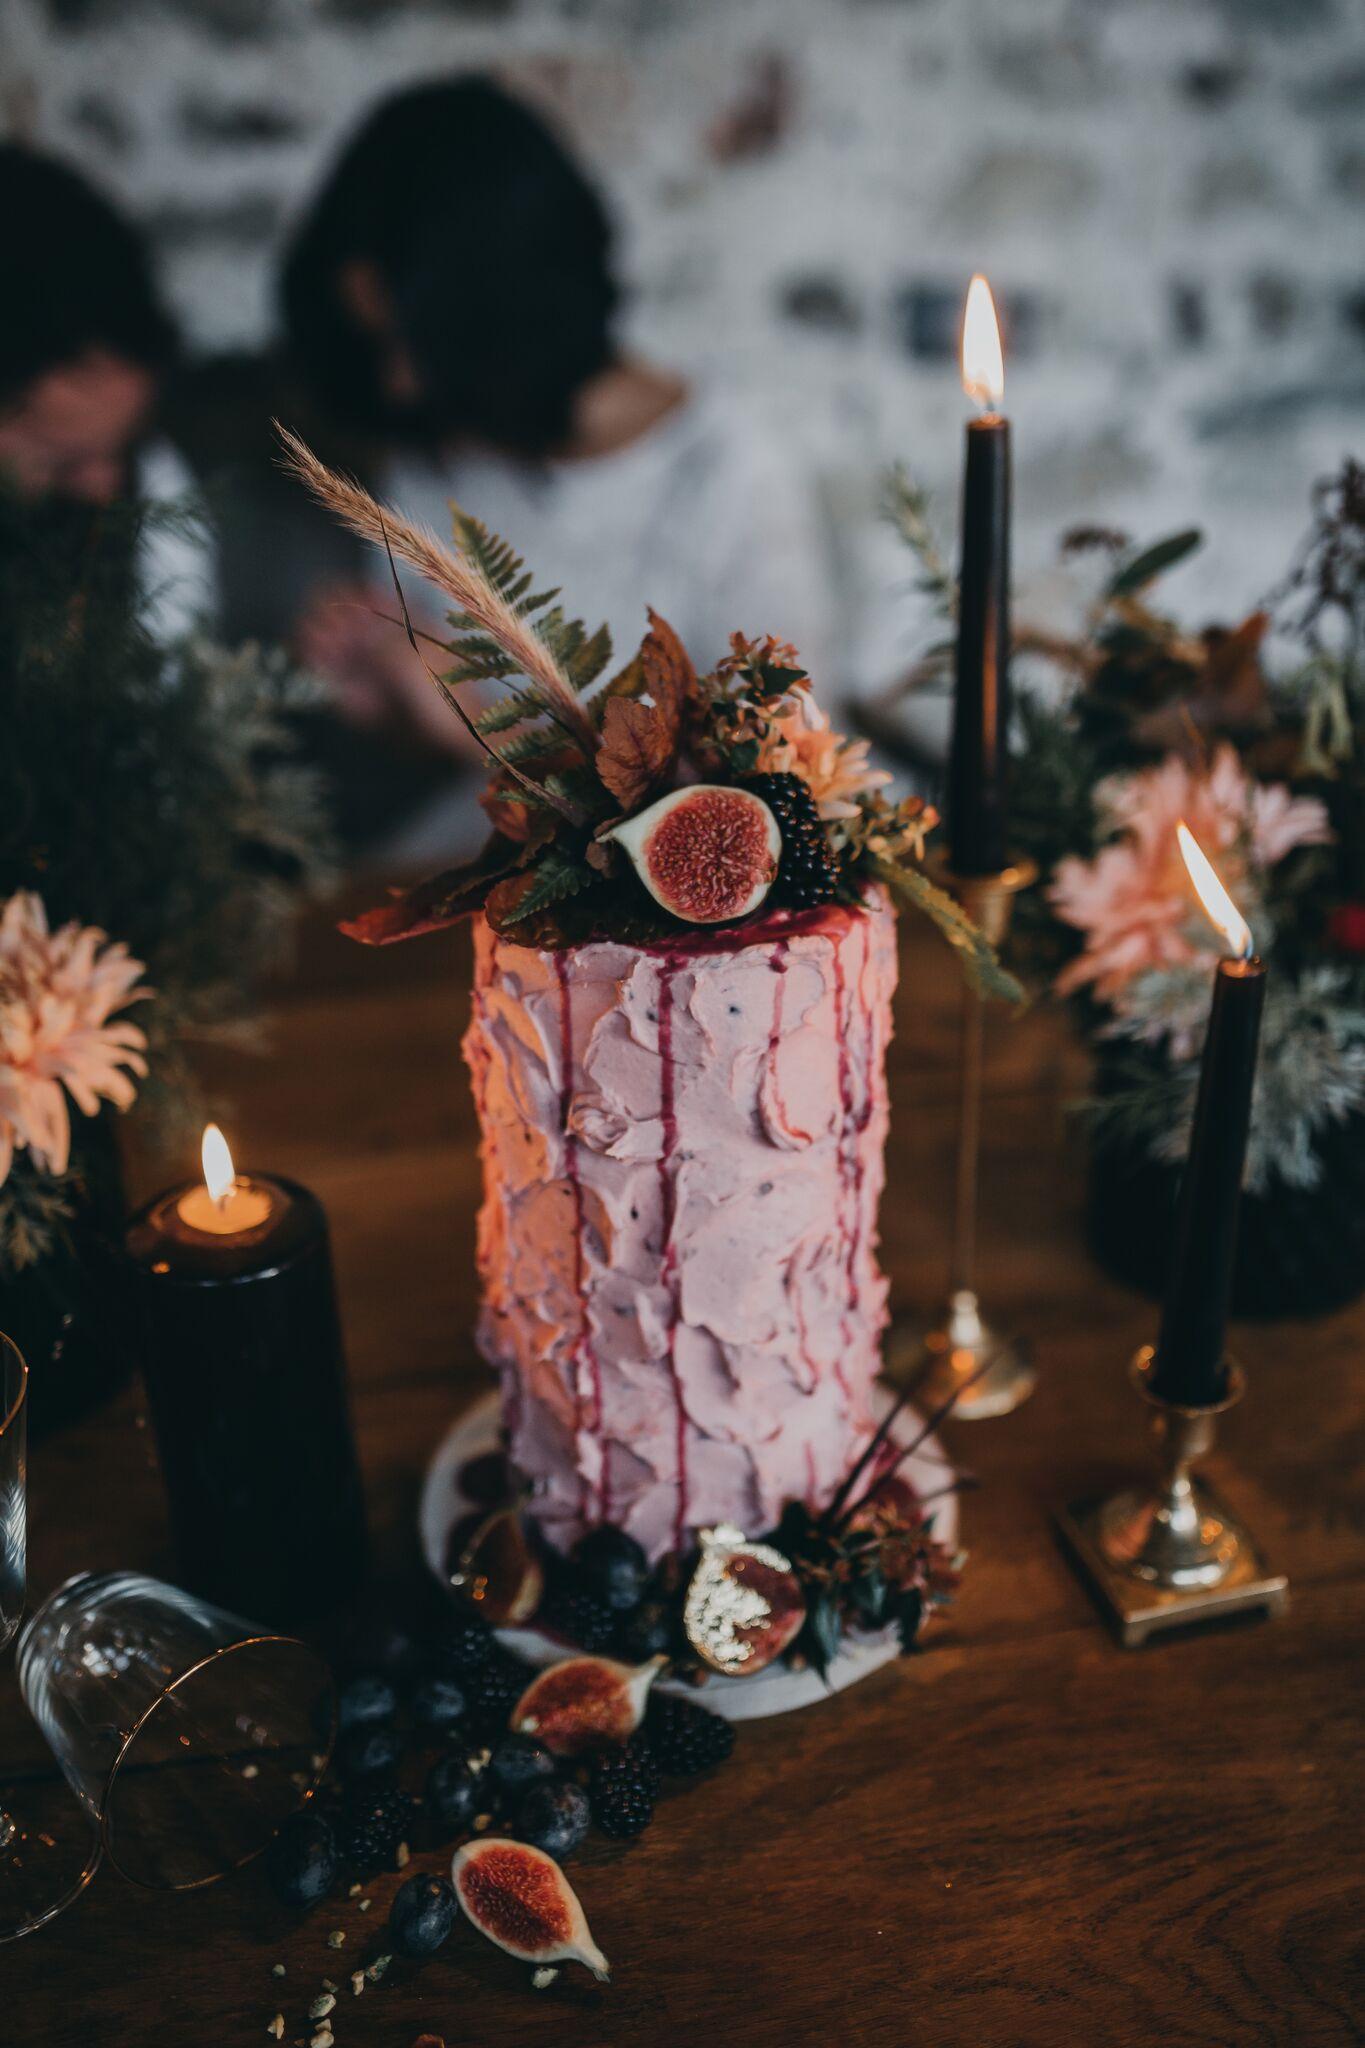 Where the Ribbon Ends - Alternative wedding cake - Creative wedding cake 2